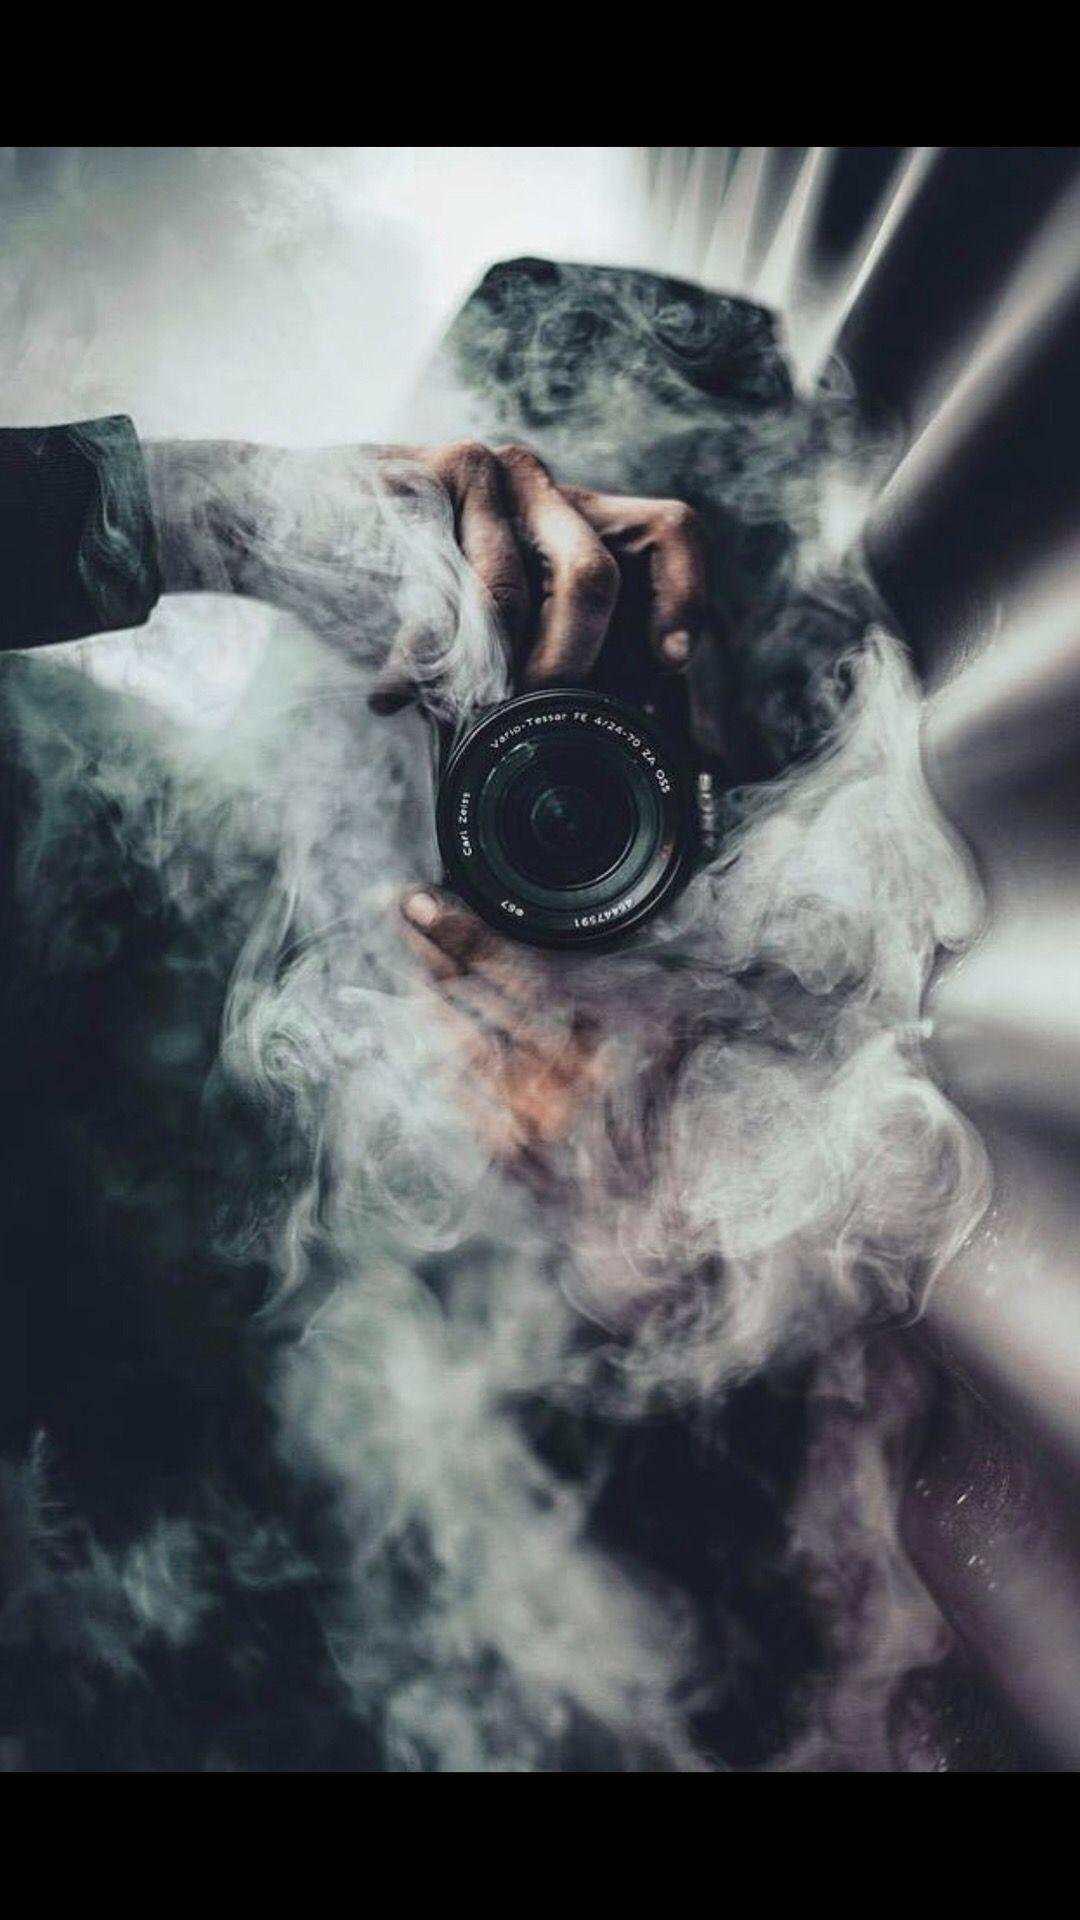 Love the smoke bomb effect around the camera! #creativephotography